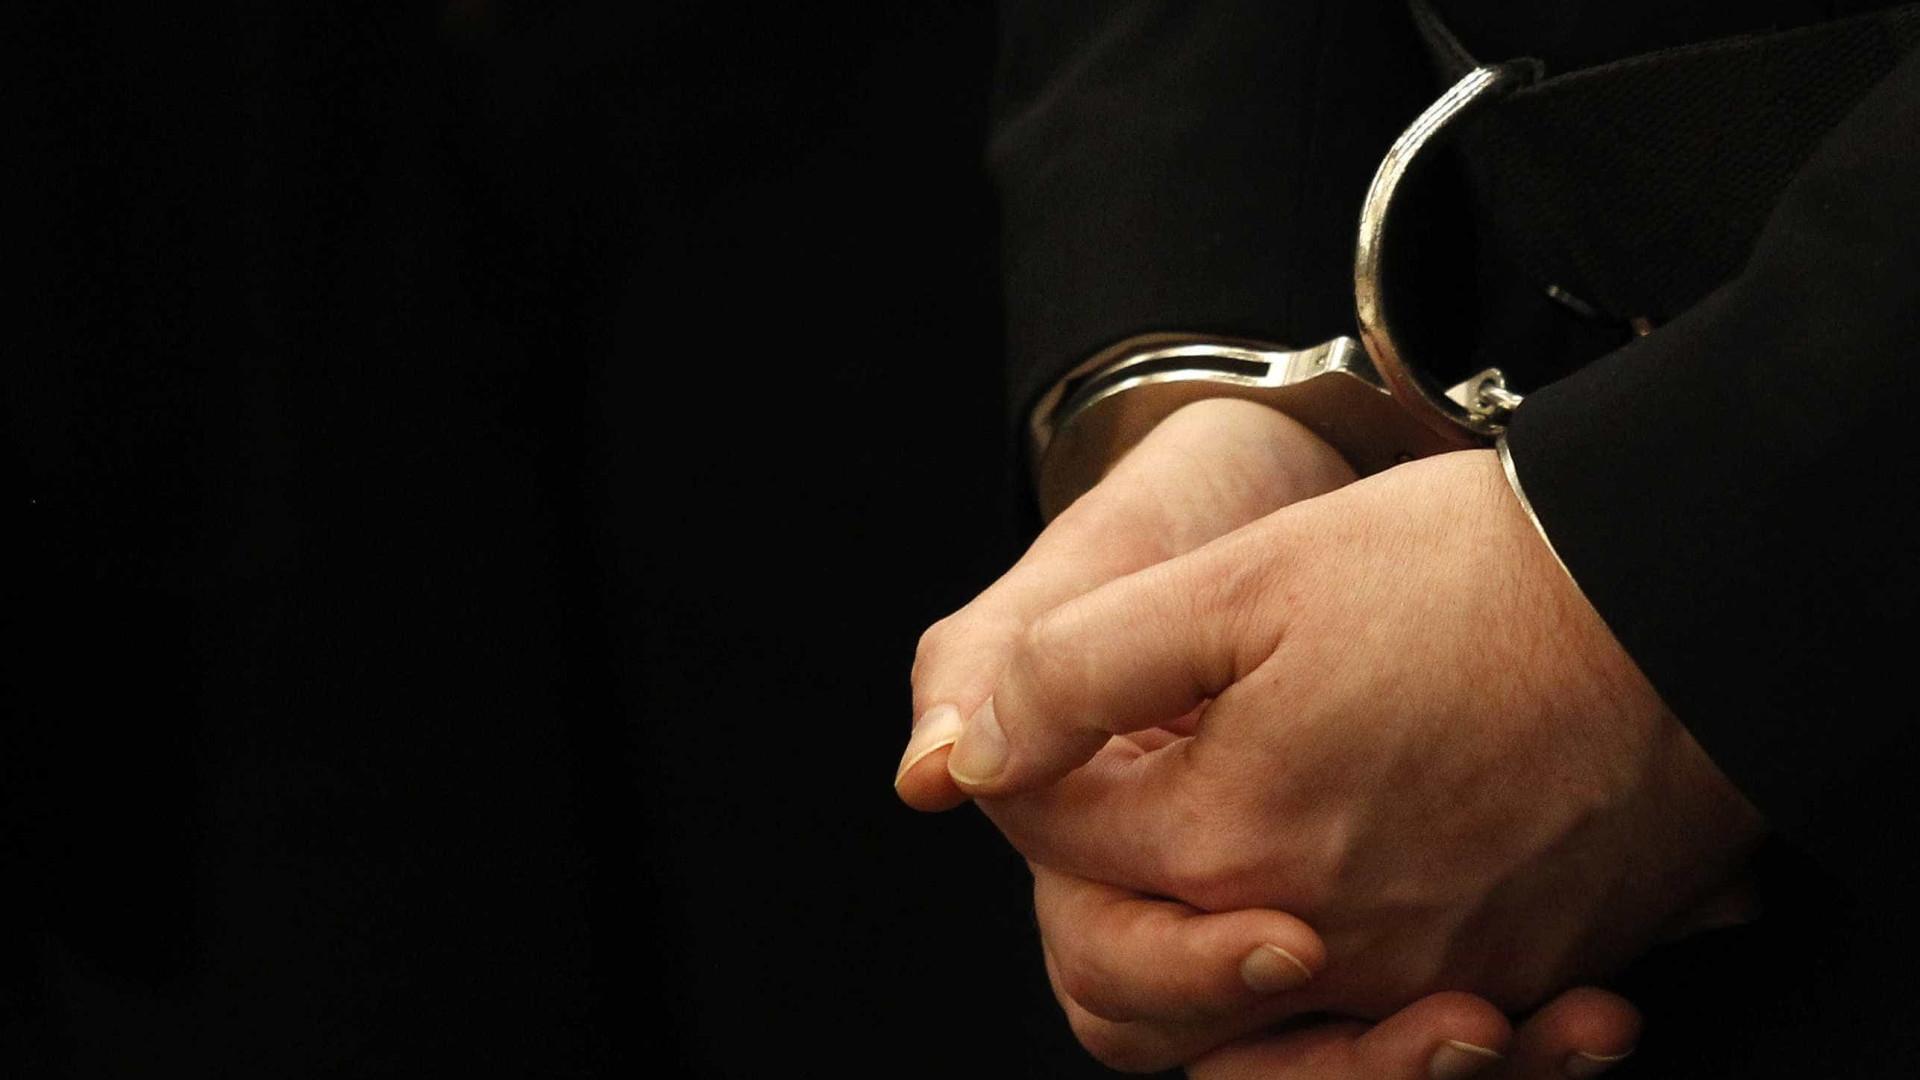 Idoso detido por assaltar banco na Suíça